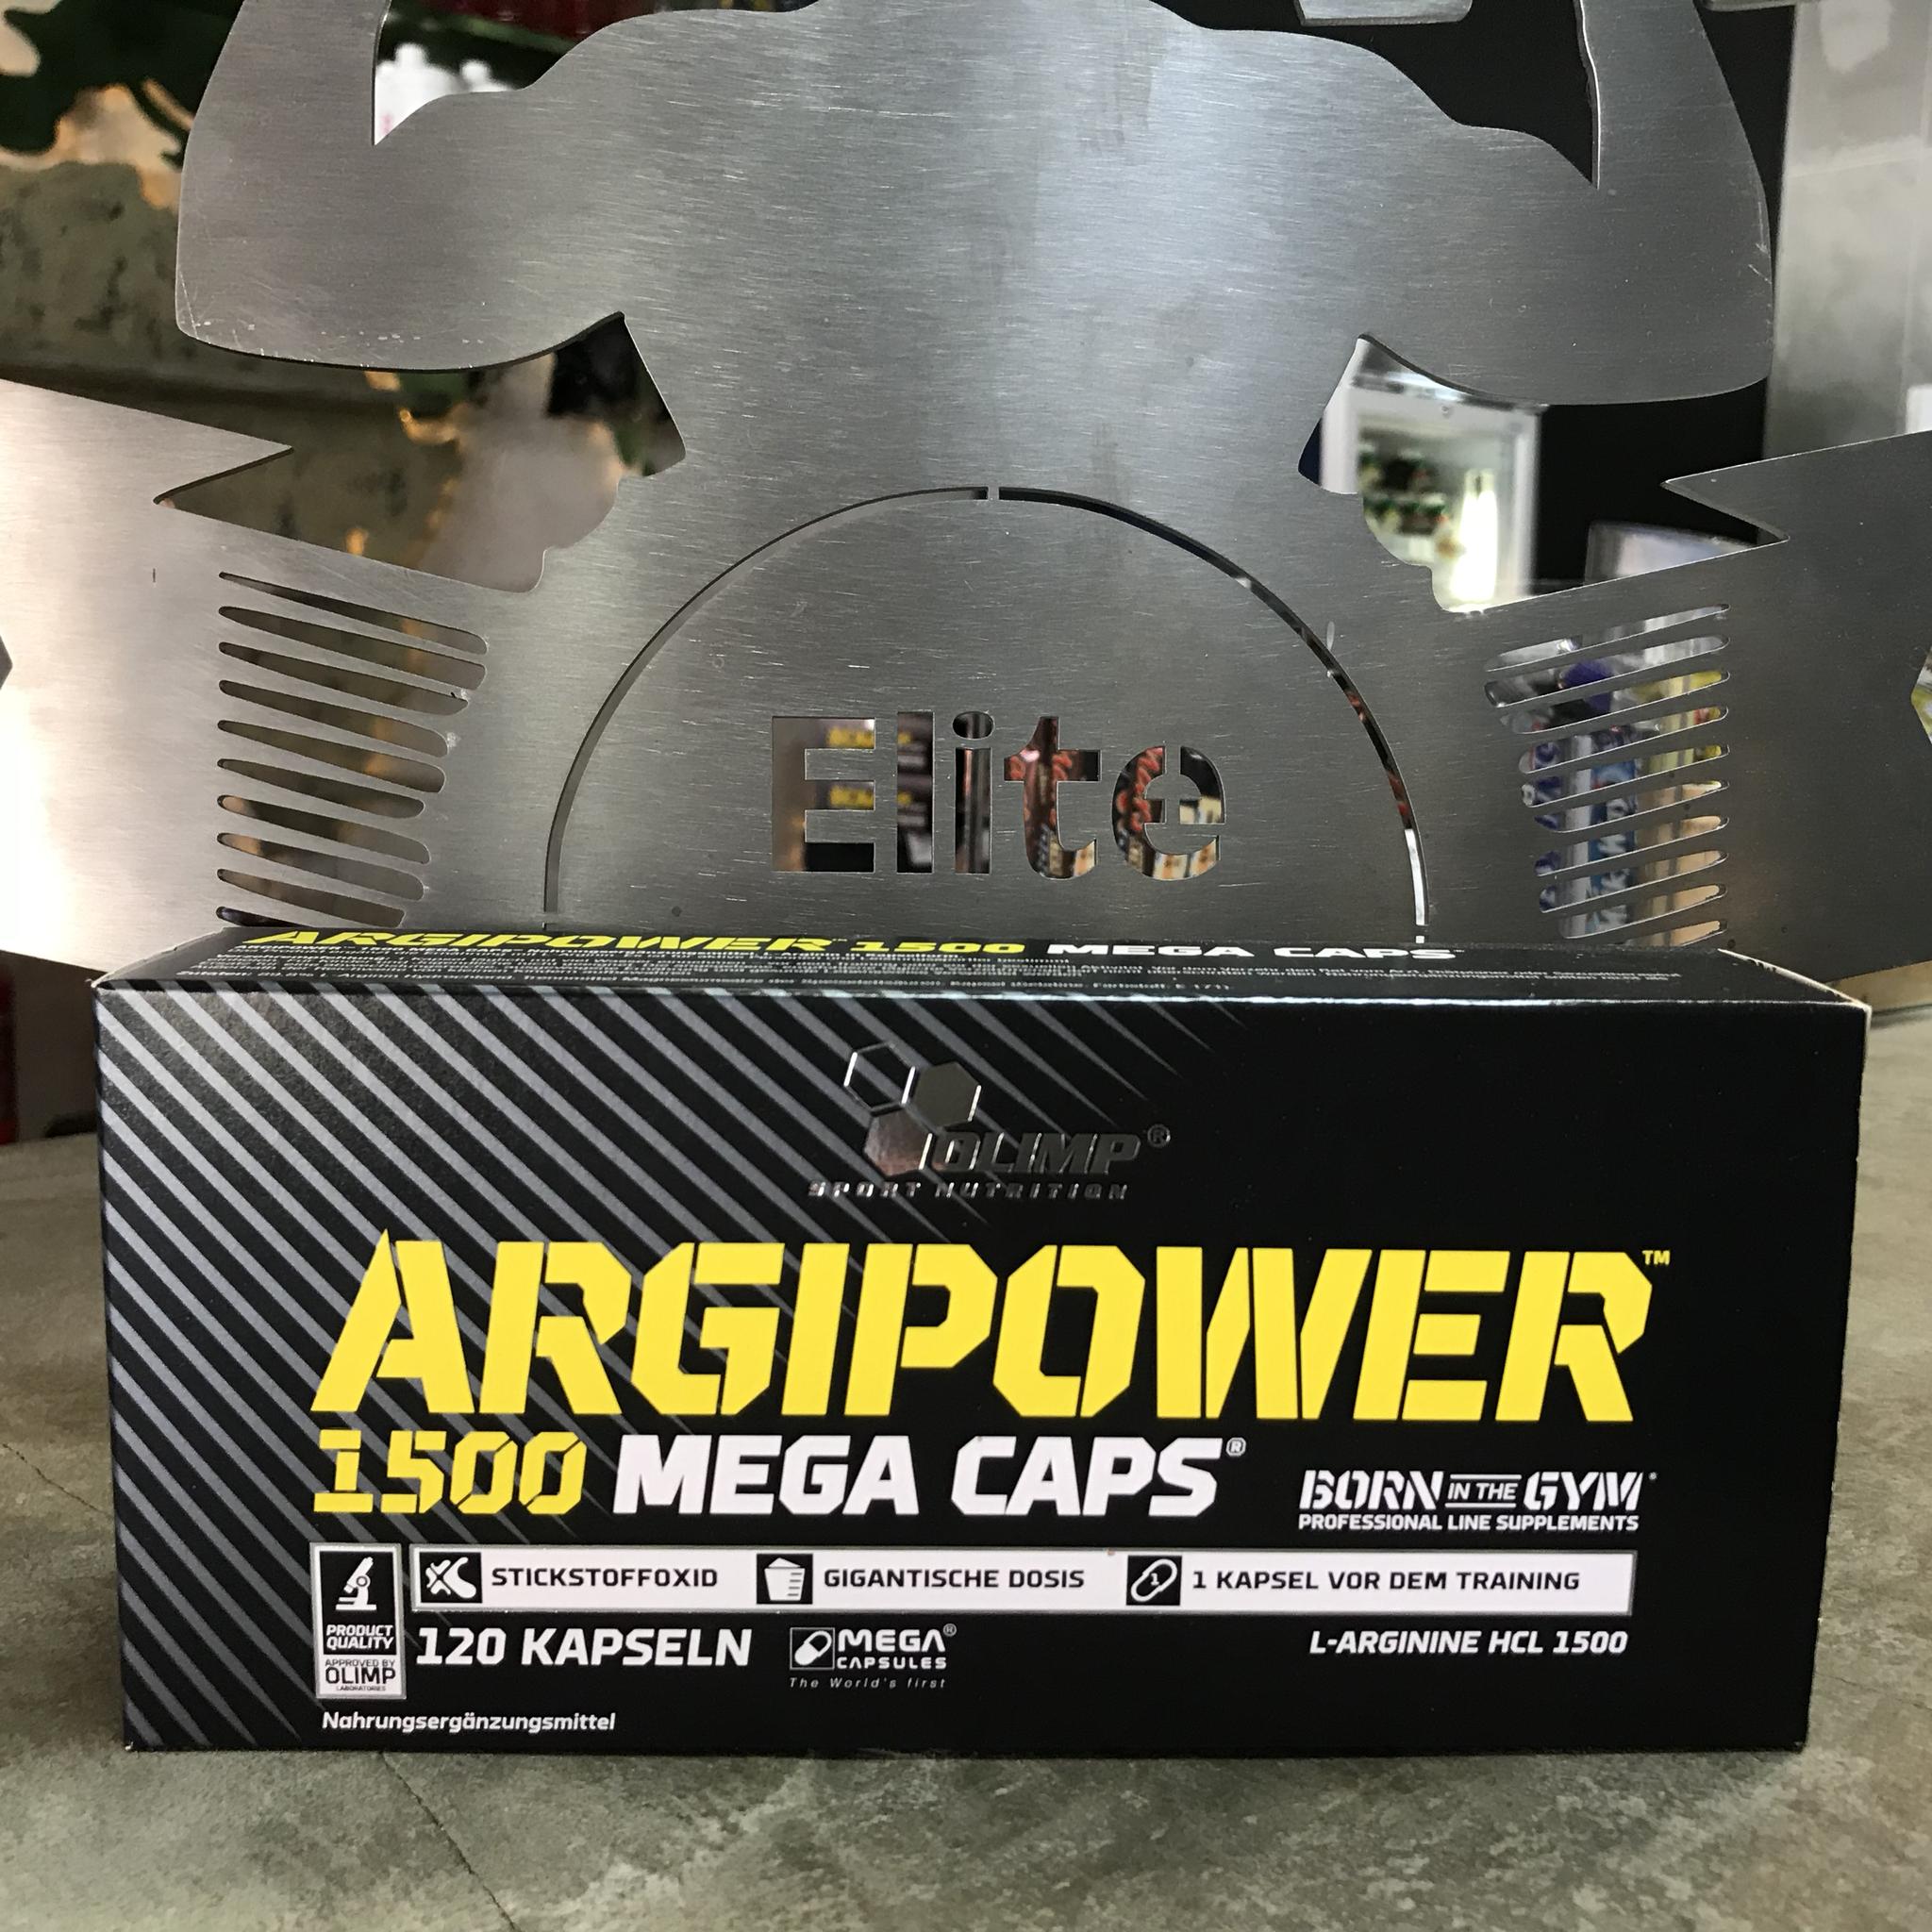 Argipower - 1500 Mega Caps Jetzt minus 40%!!! 00024